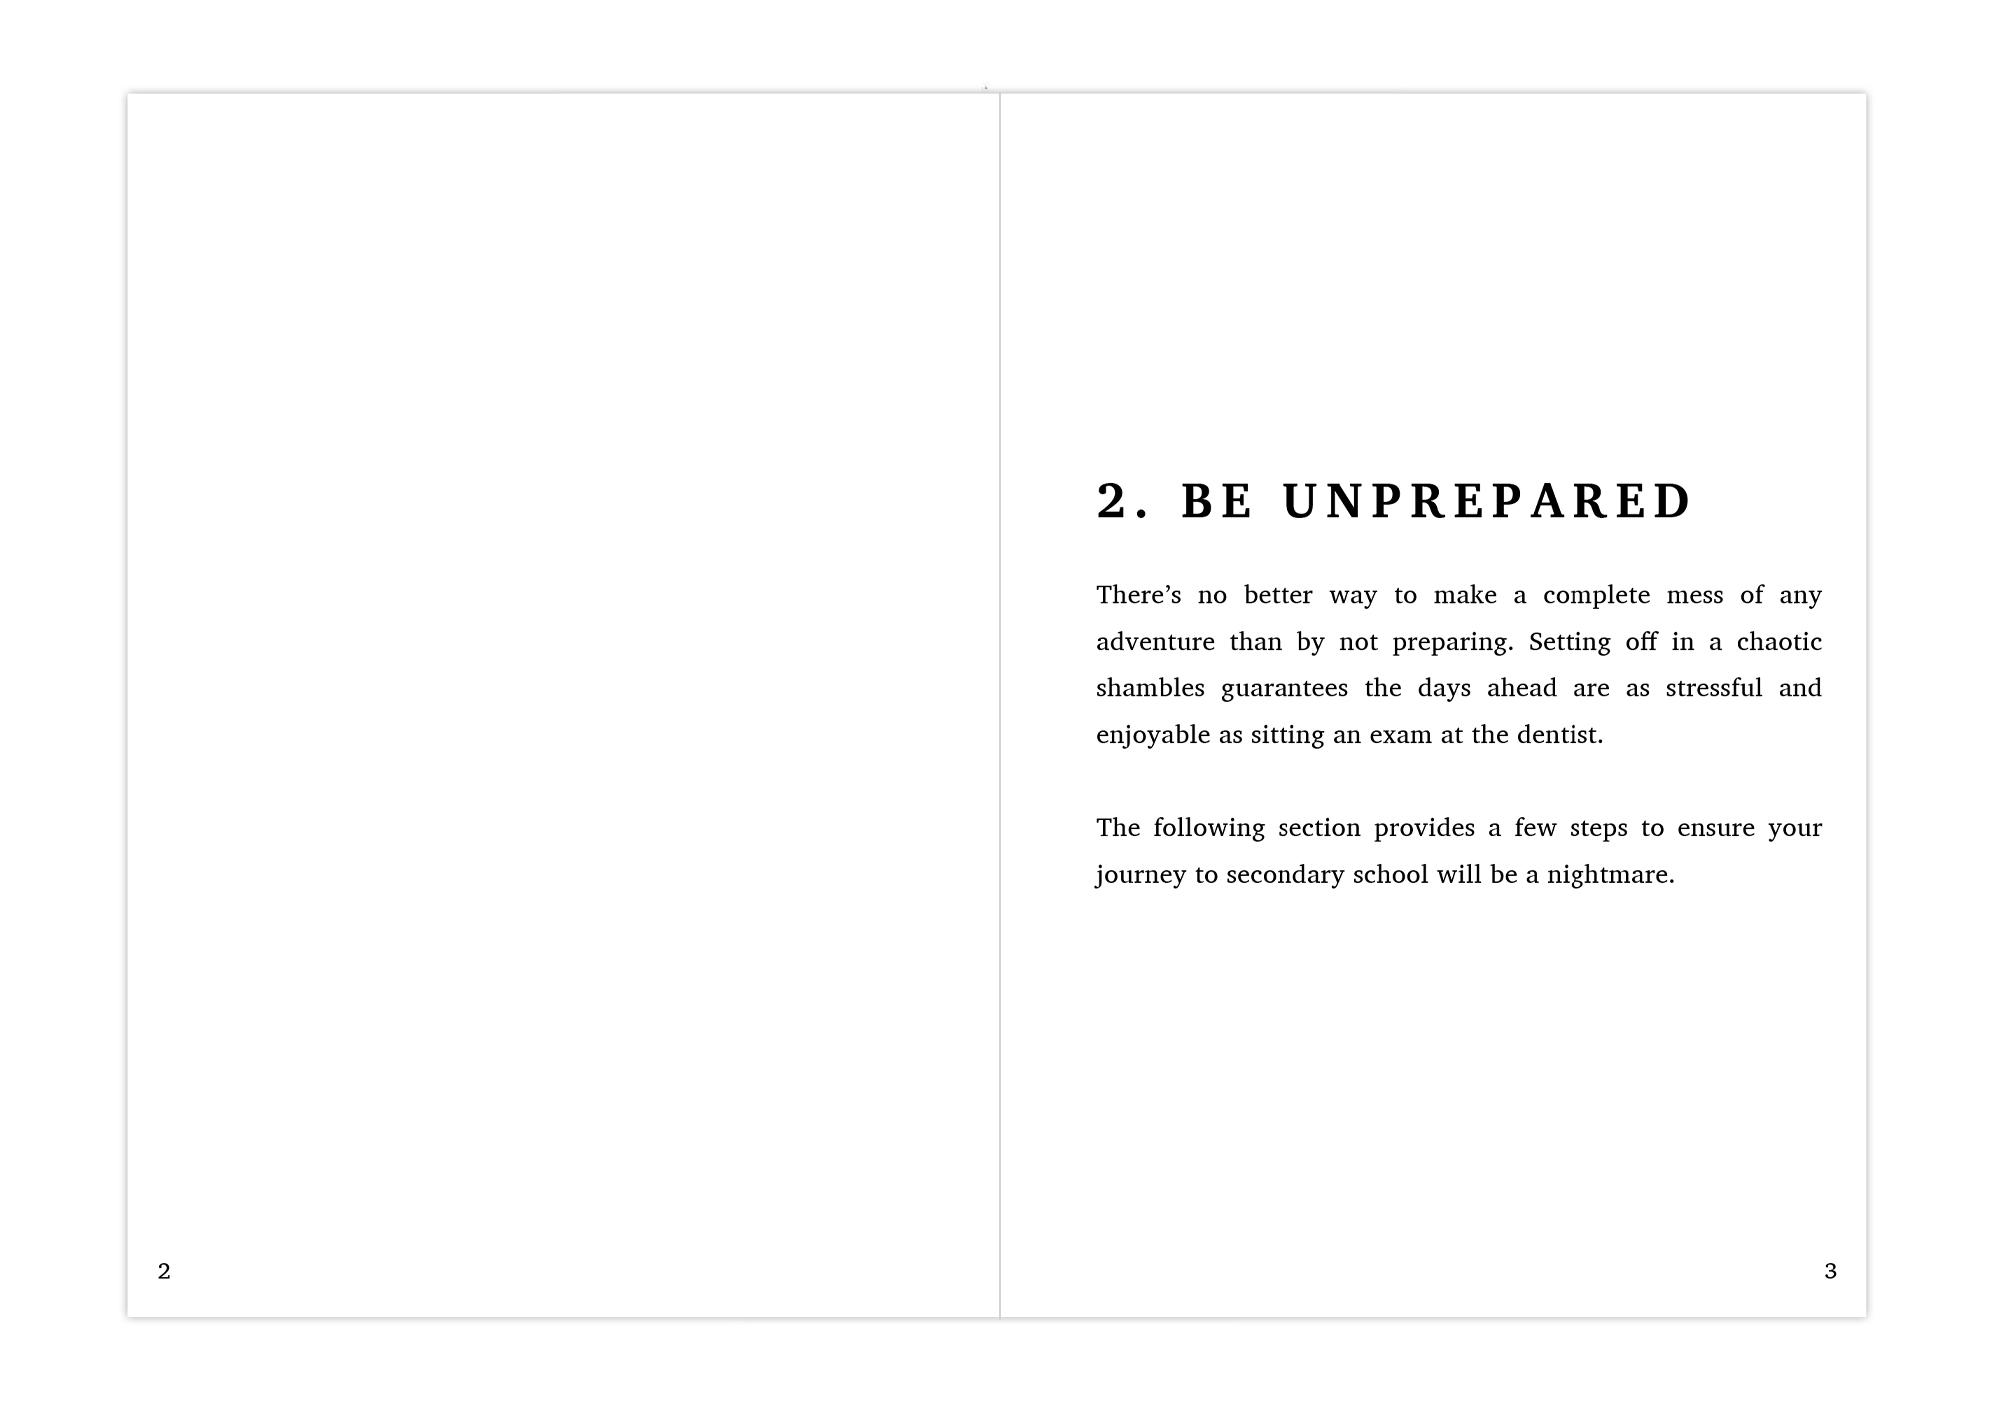 DG-spread-be unprepared.jpg